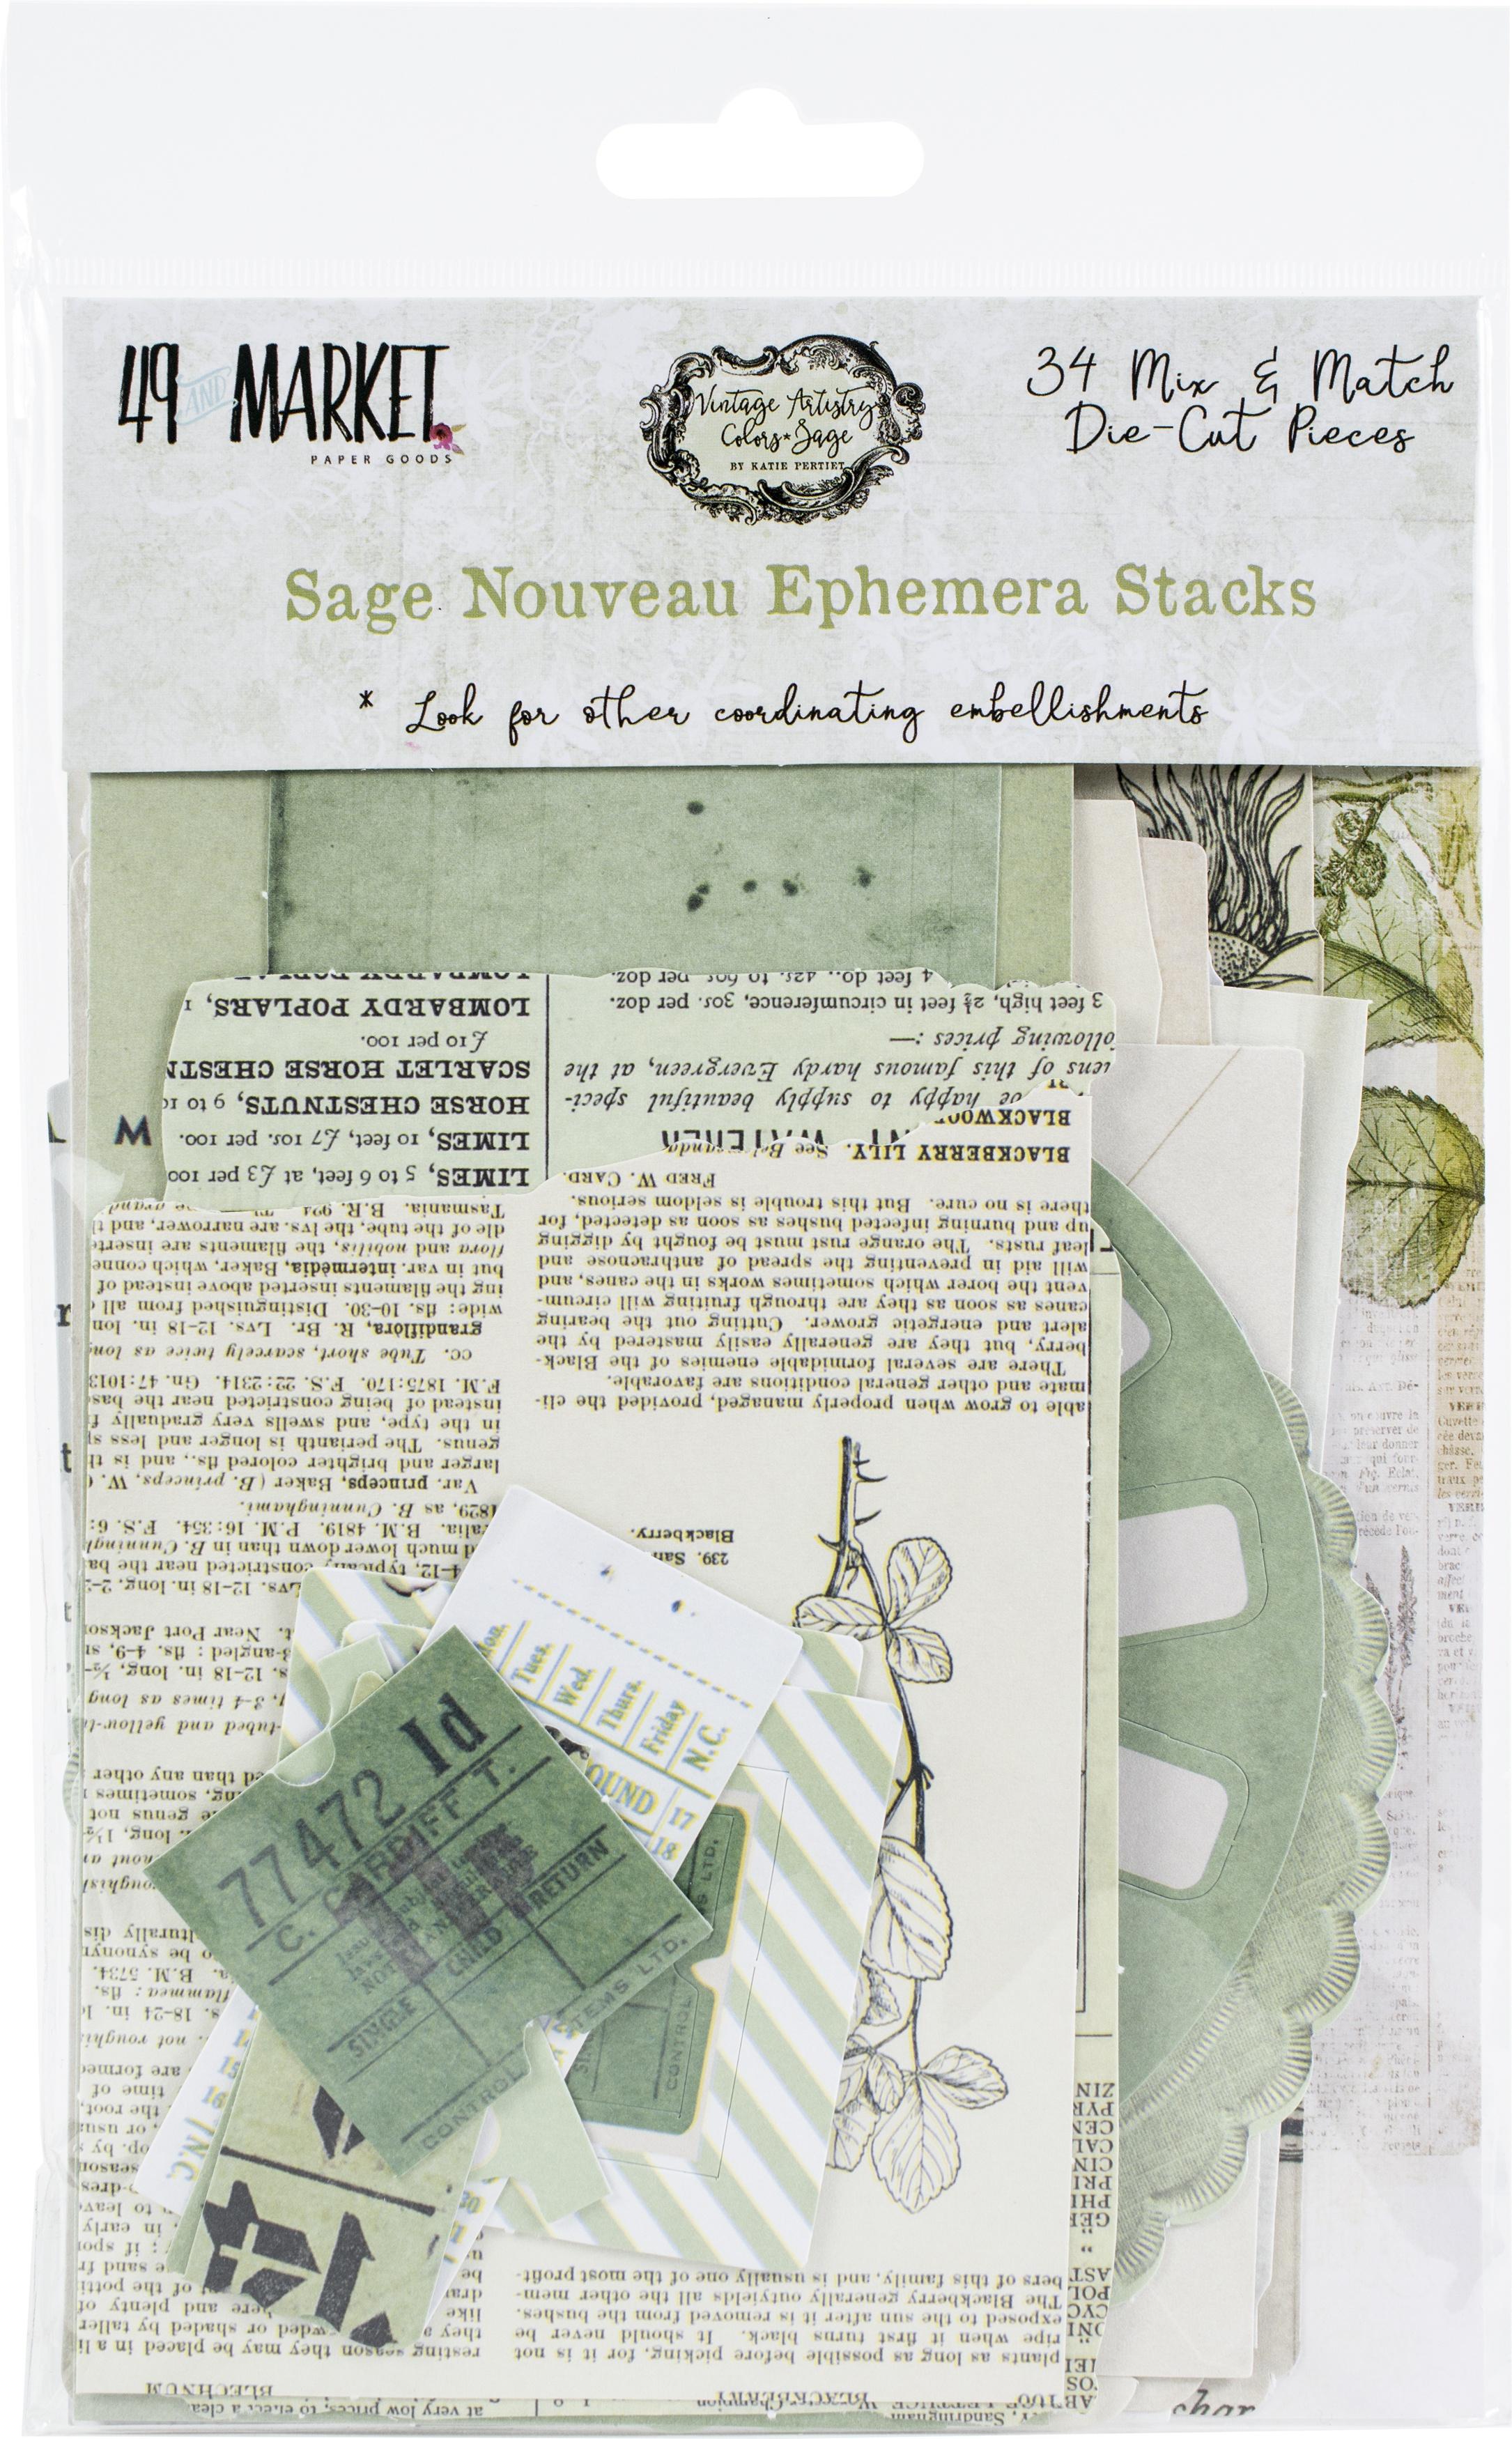 49 And Market - Sage Nouveau Ephemera Stacks